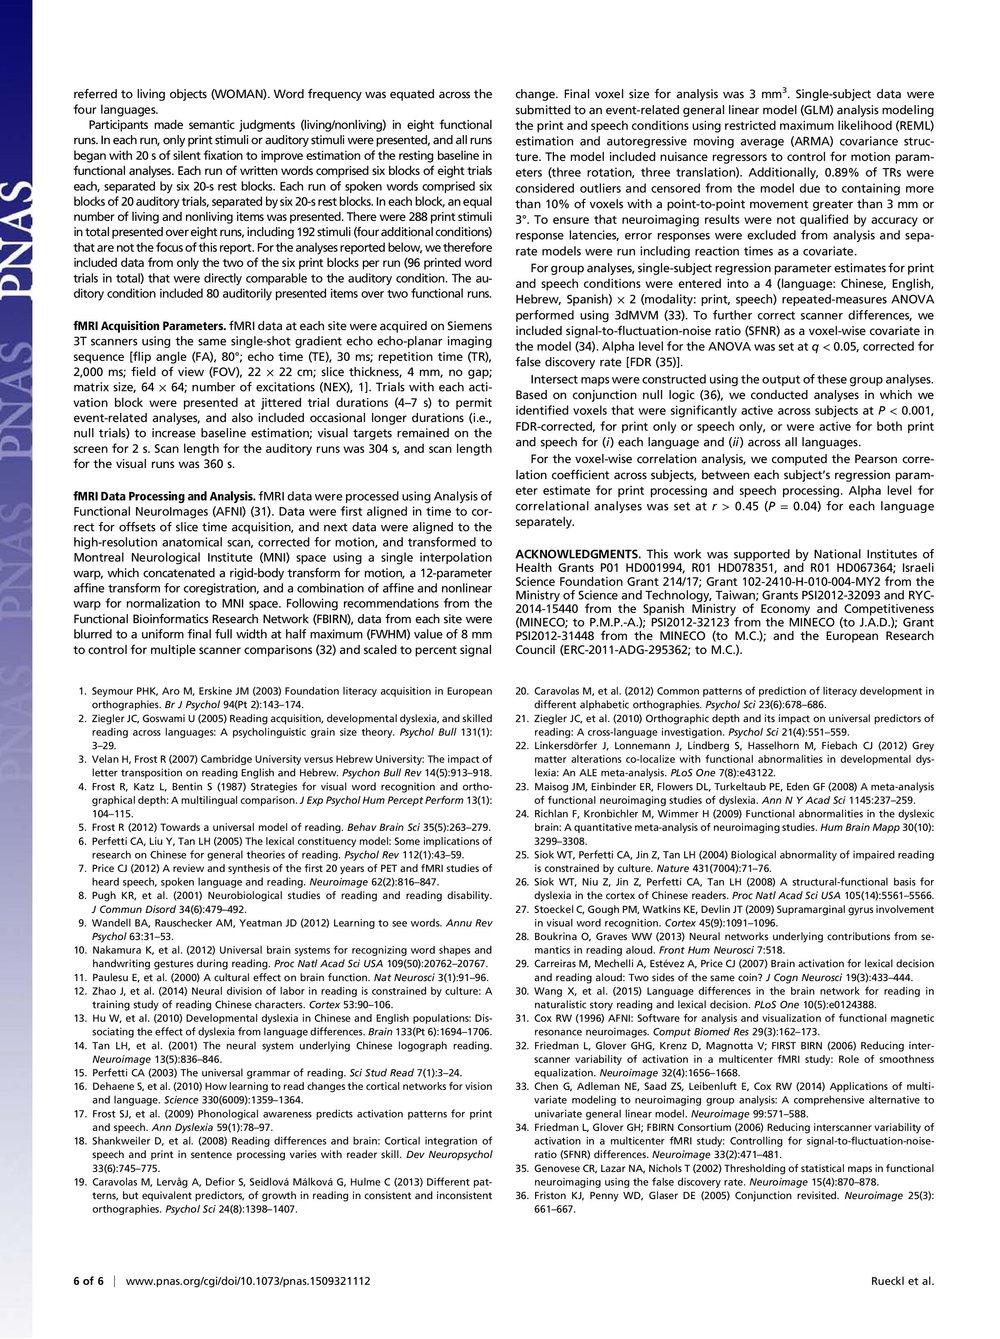 PNAS-2015-Rueckl-1509321112 (1)-page-006.jpg